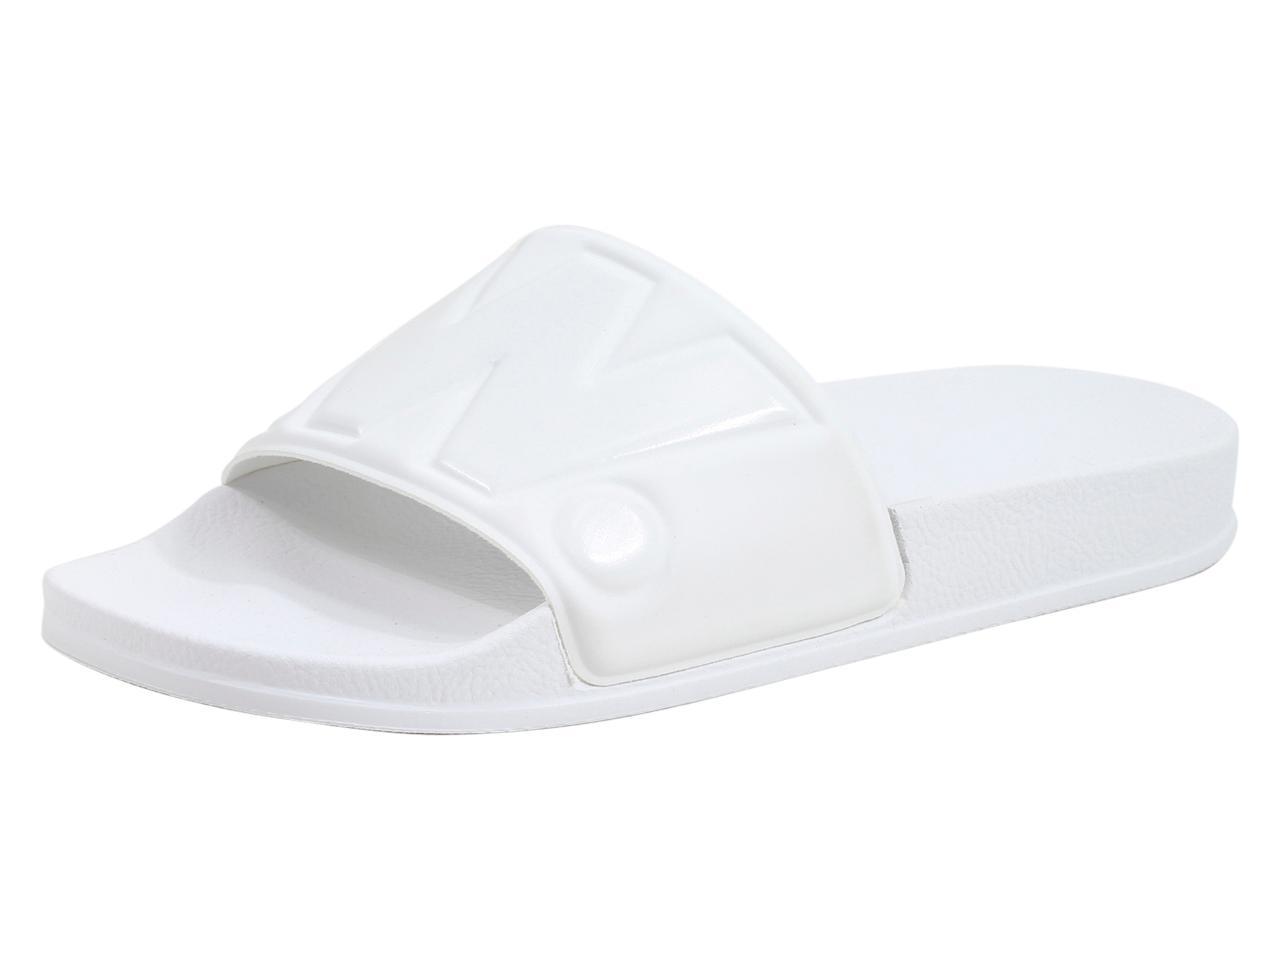 Image of G Star Raw Men's Cart Slide II Slides Sandals Shoes - White - 12 D(M) US